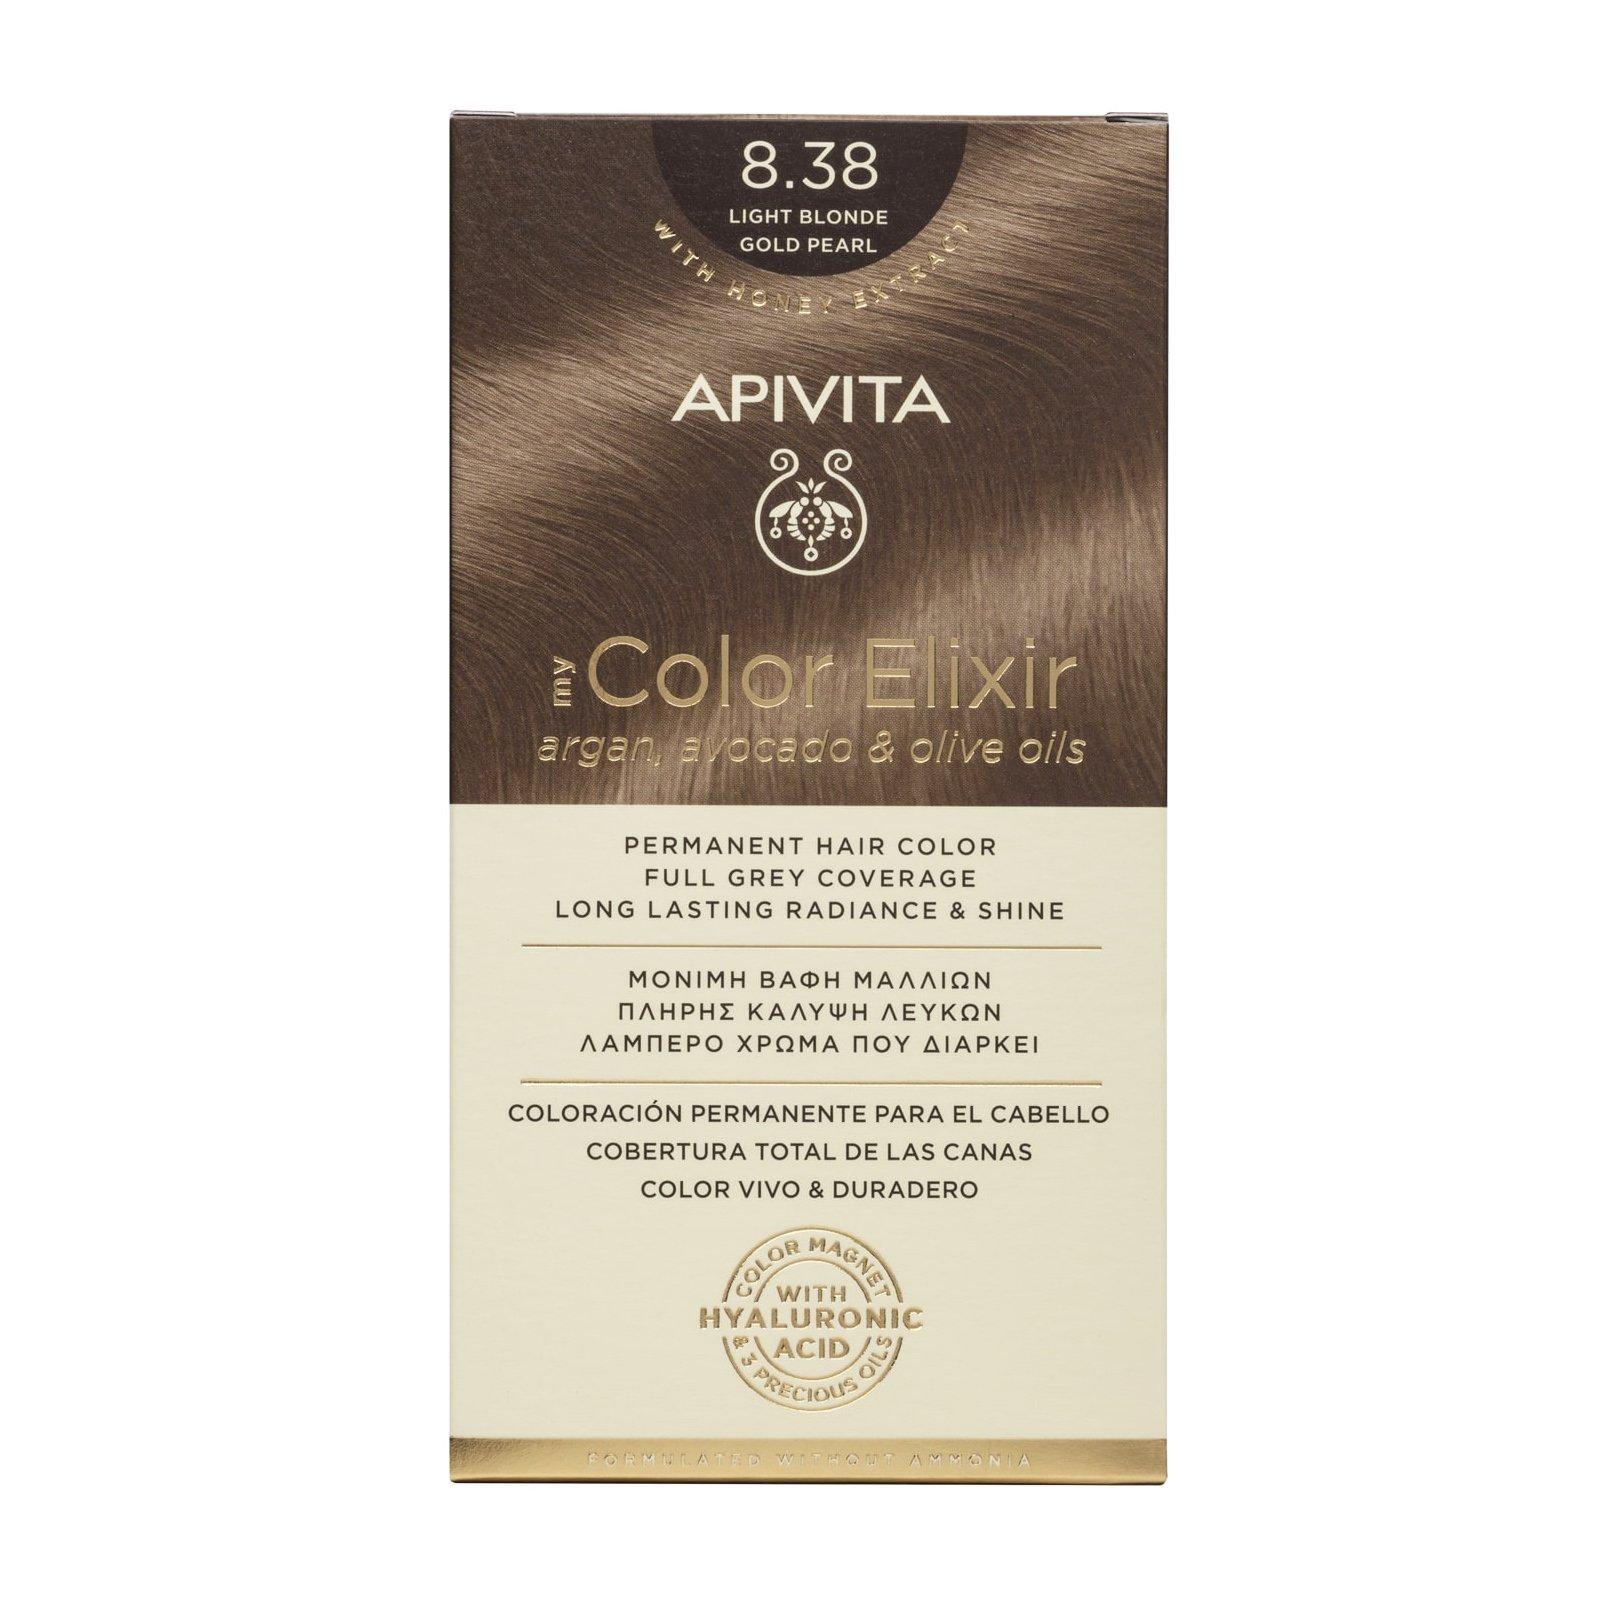 Apivita My Color Elixir Μόνιμη Βαφή Μαλλιών με Καινοτόμο Σύστημα Color Magnet που Σταθεροποιεί και Σφραγίζει το Χρώμα στην Τρίχα – N 8.38 ΞΑΝΘΟ ΑΝΟΙΧΤΟ ΜΕΛΙ ΠΕΡΛΕ